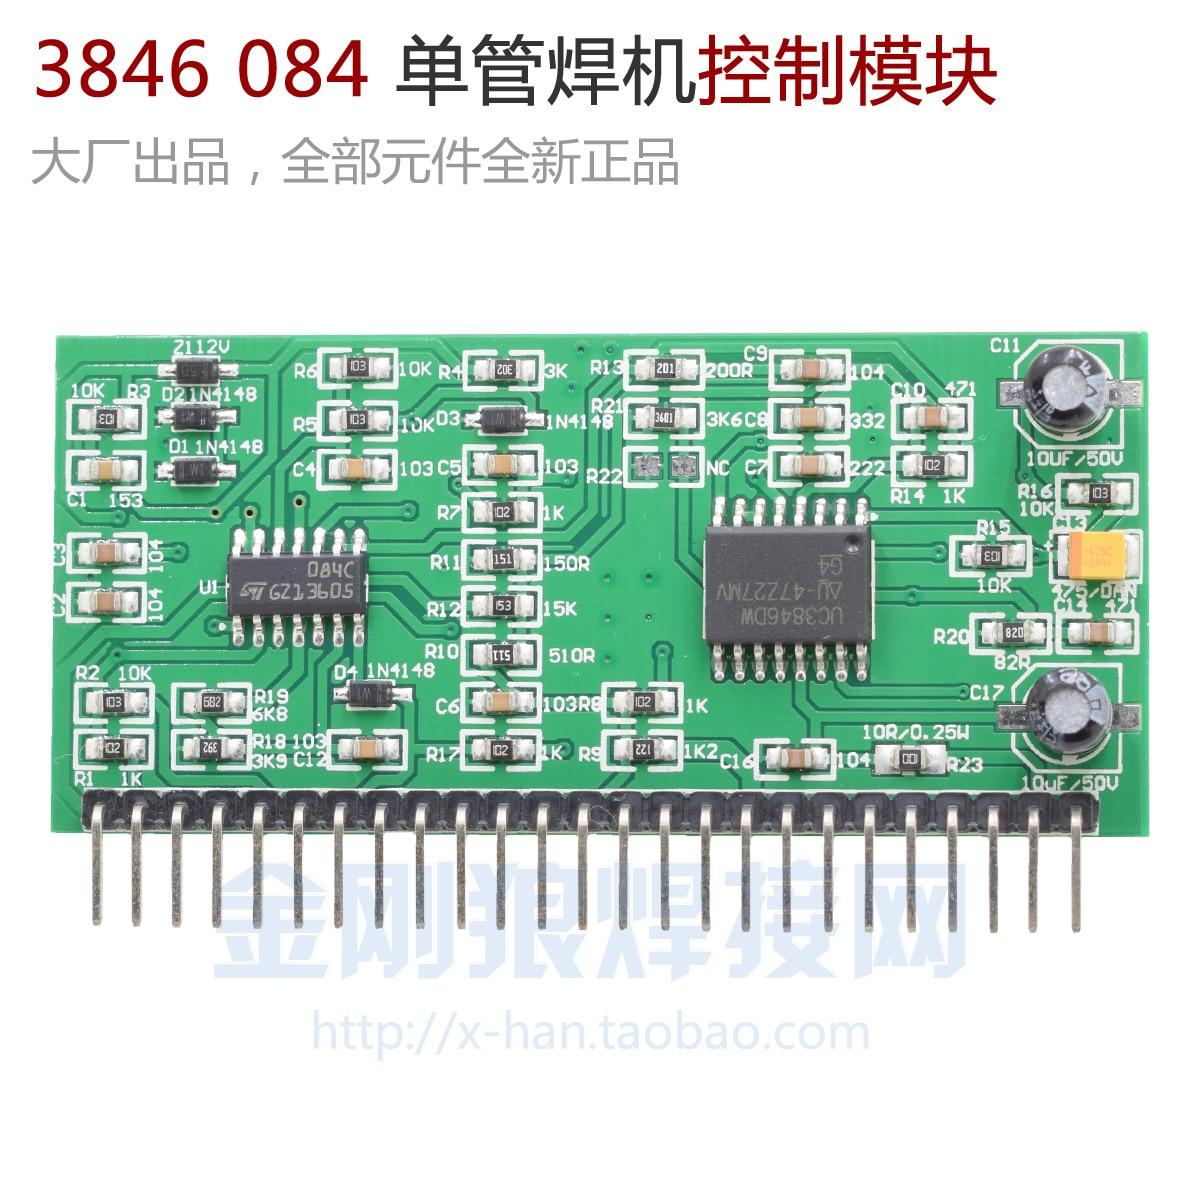 Mosfet Arc200 200a Control Module Pcb Drive For Rilon Arc 160 Mesin Las Inverter Ac 220v 1 Phase Mma Ydt Pipa Tunggal Igbt Modul Kontrol Kecil Pelat Vertikal 3846 084c